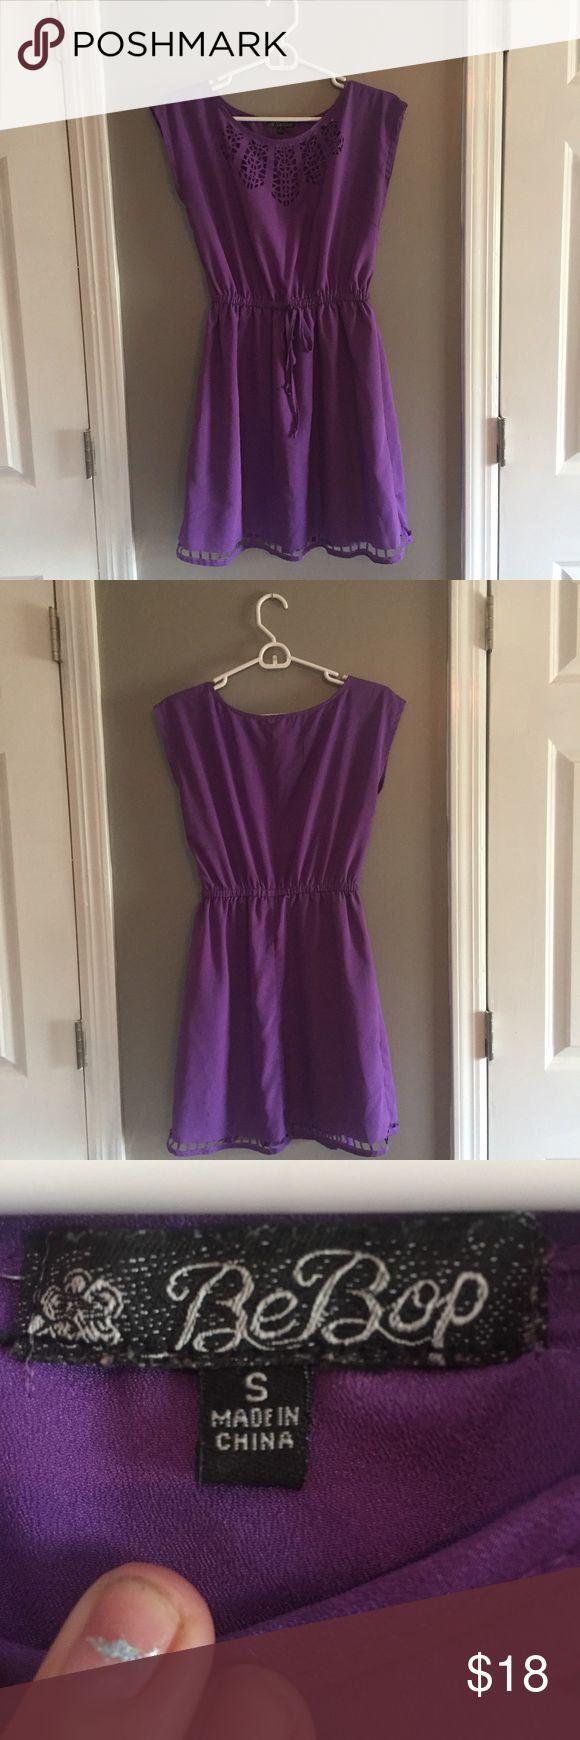 Cute Purple Sundress Light purple Sundress perfect for summer! BeBop Dresses